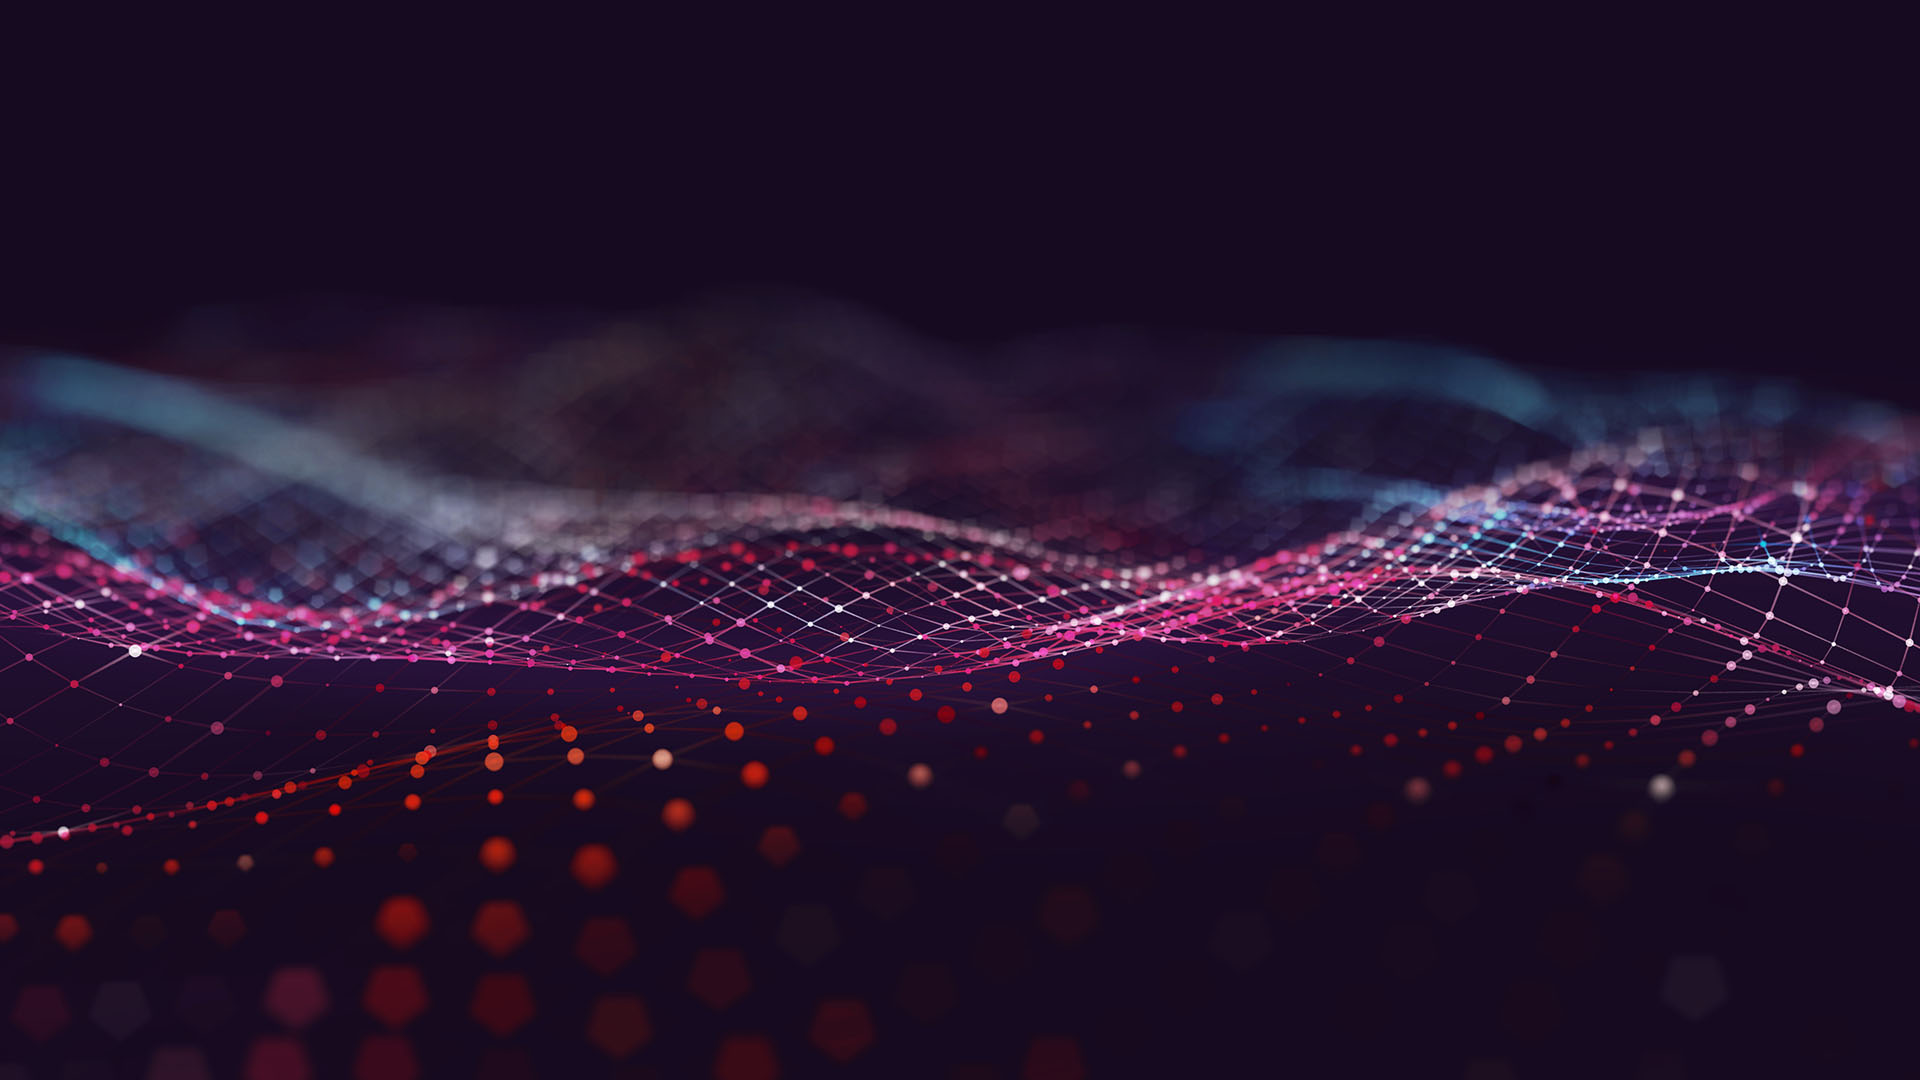 Abstract inside tech law talks